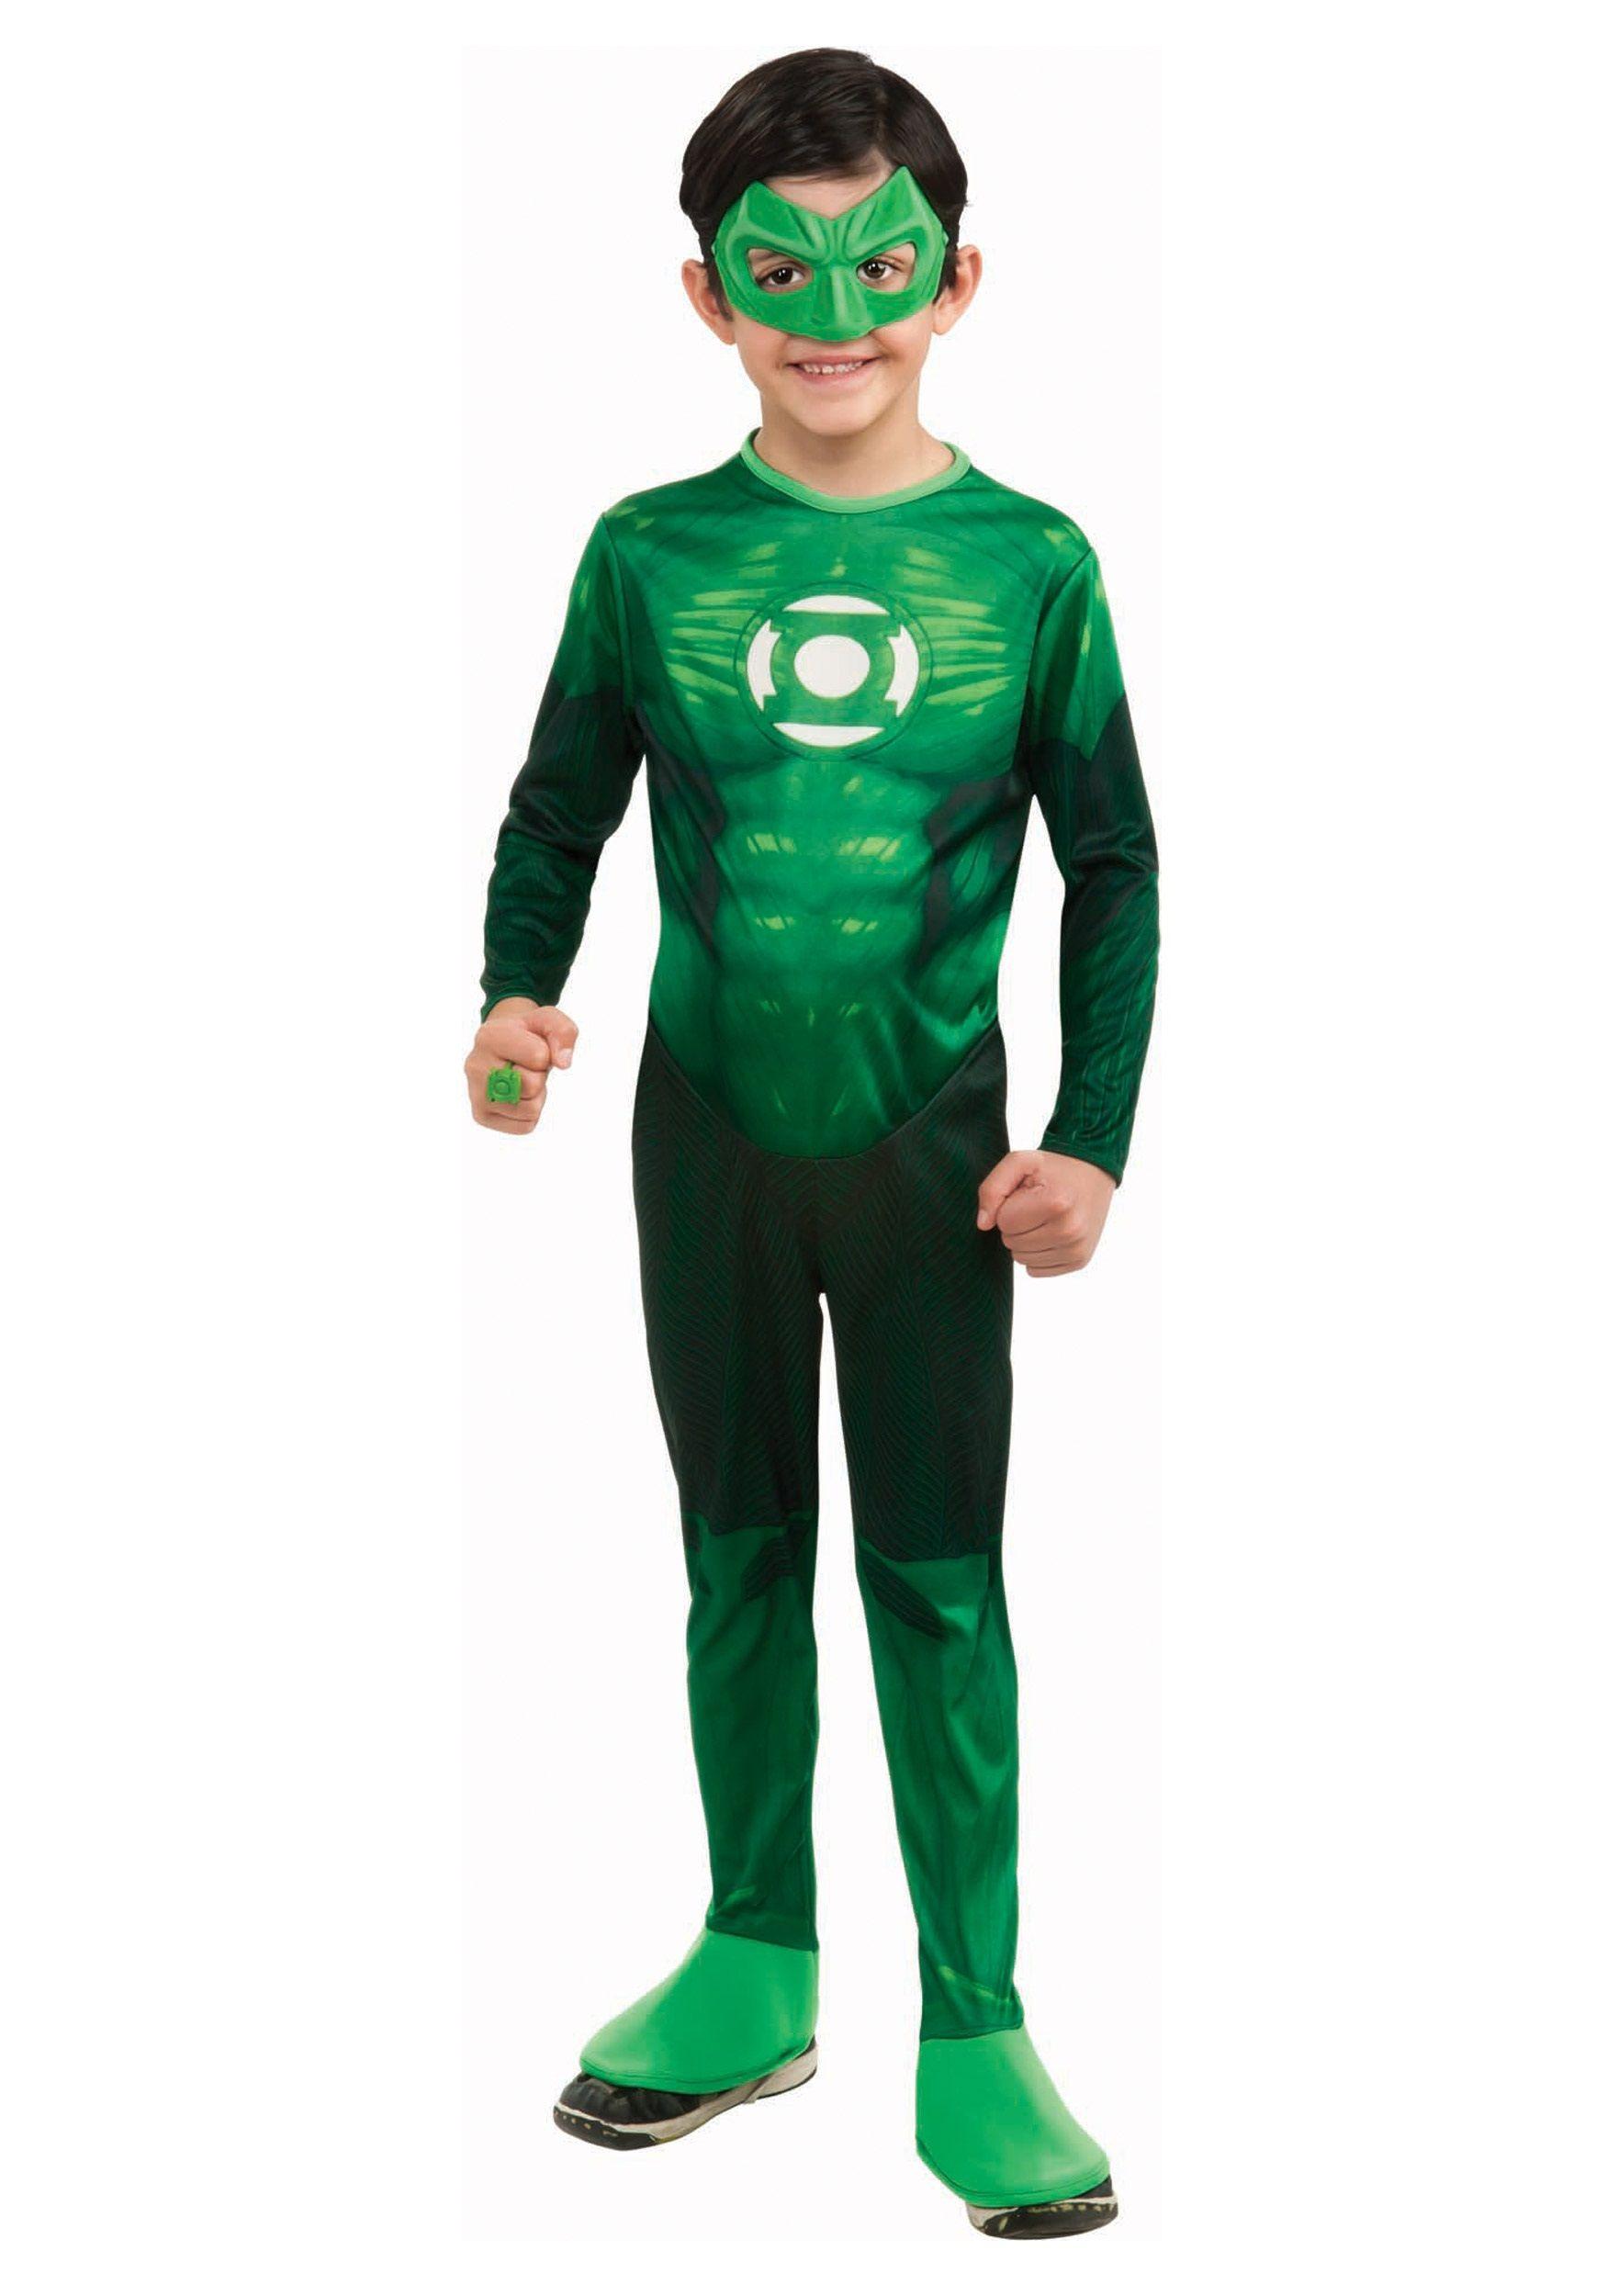 Green Lantern Justice League Superhero Fancy Dress Up Halloween Child Costume